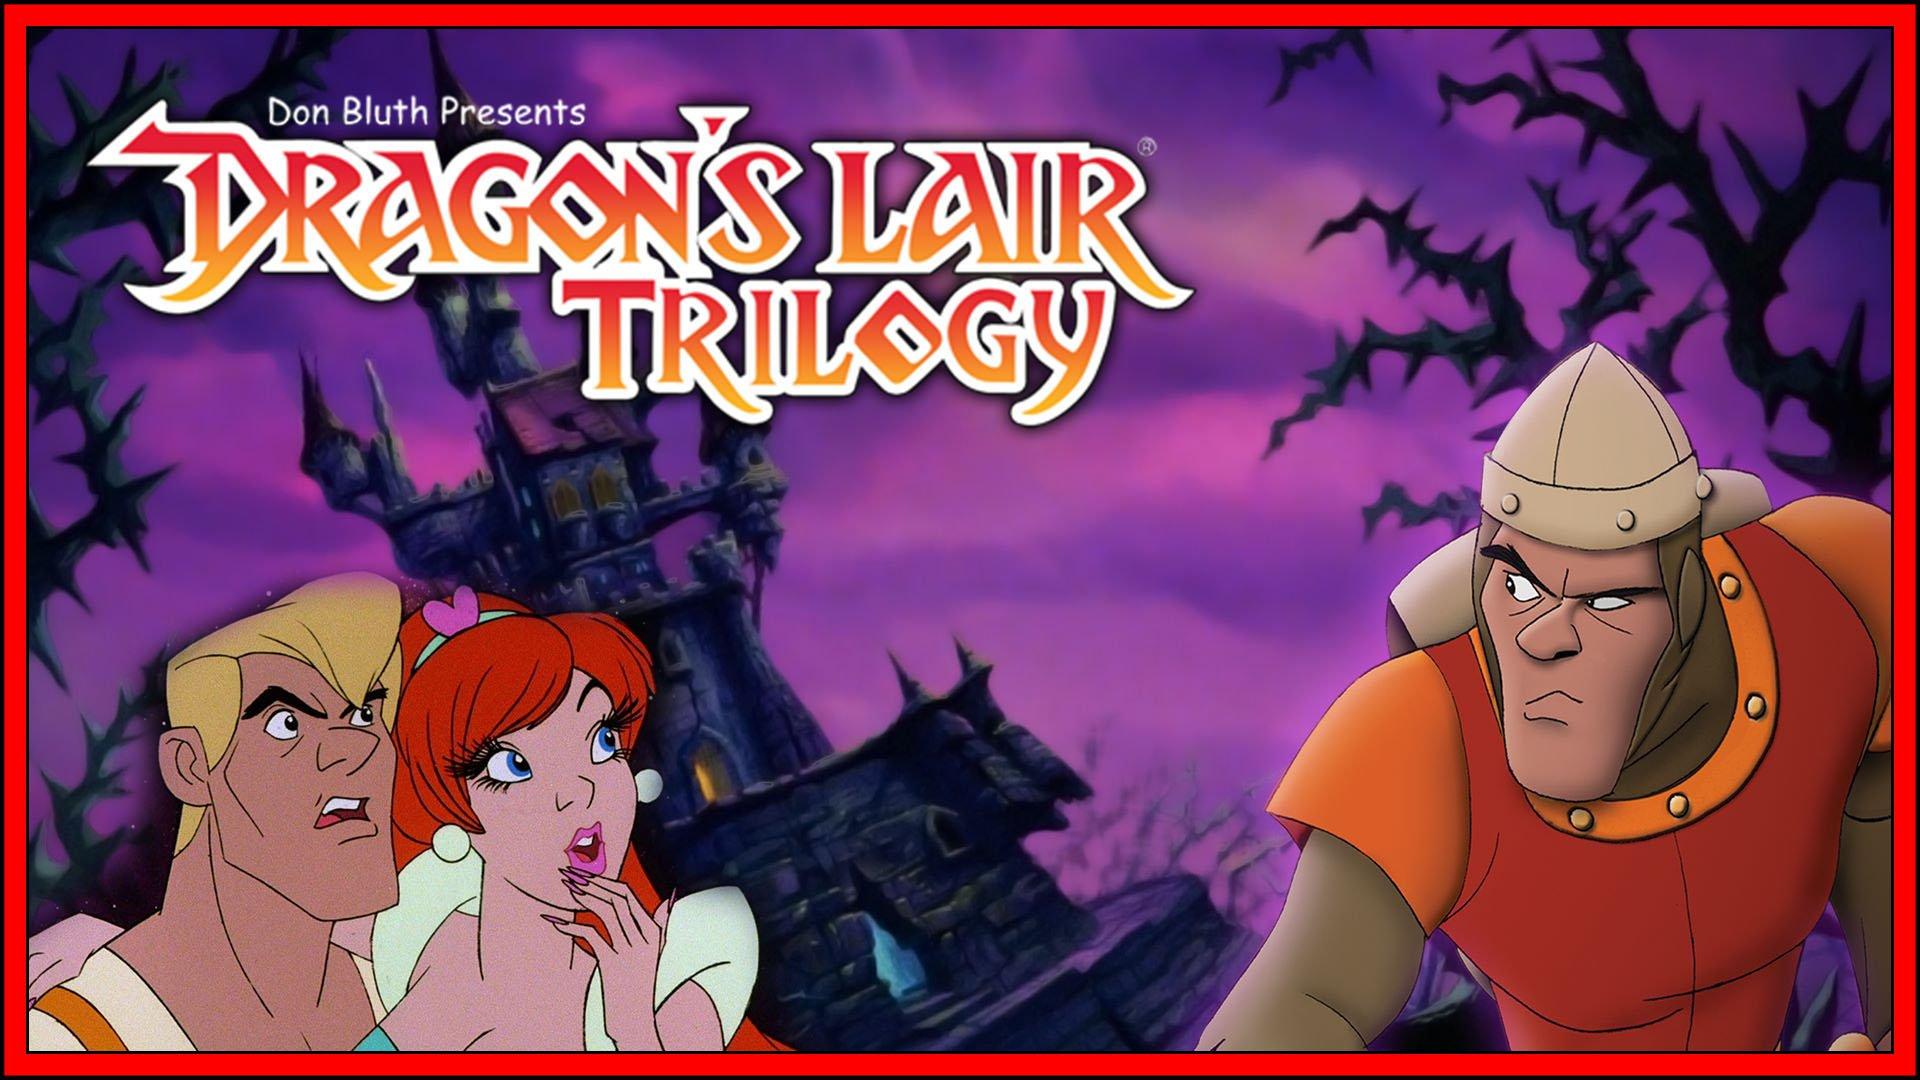 Dragon's Lair Trilogy (Nintendo Switch) Review